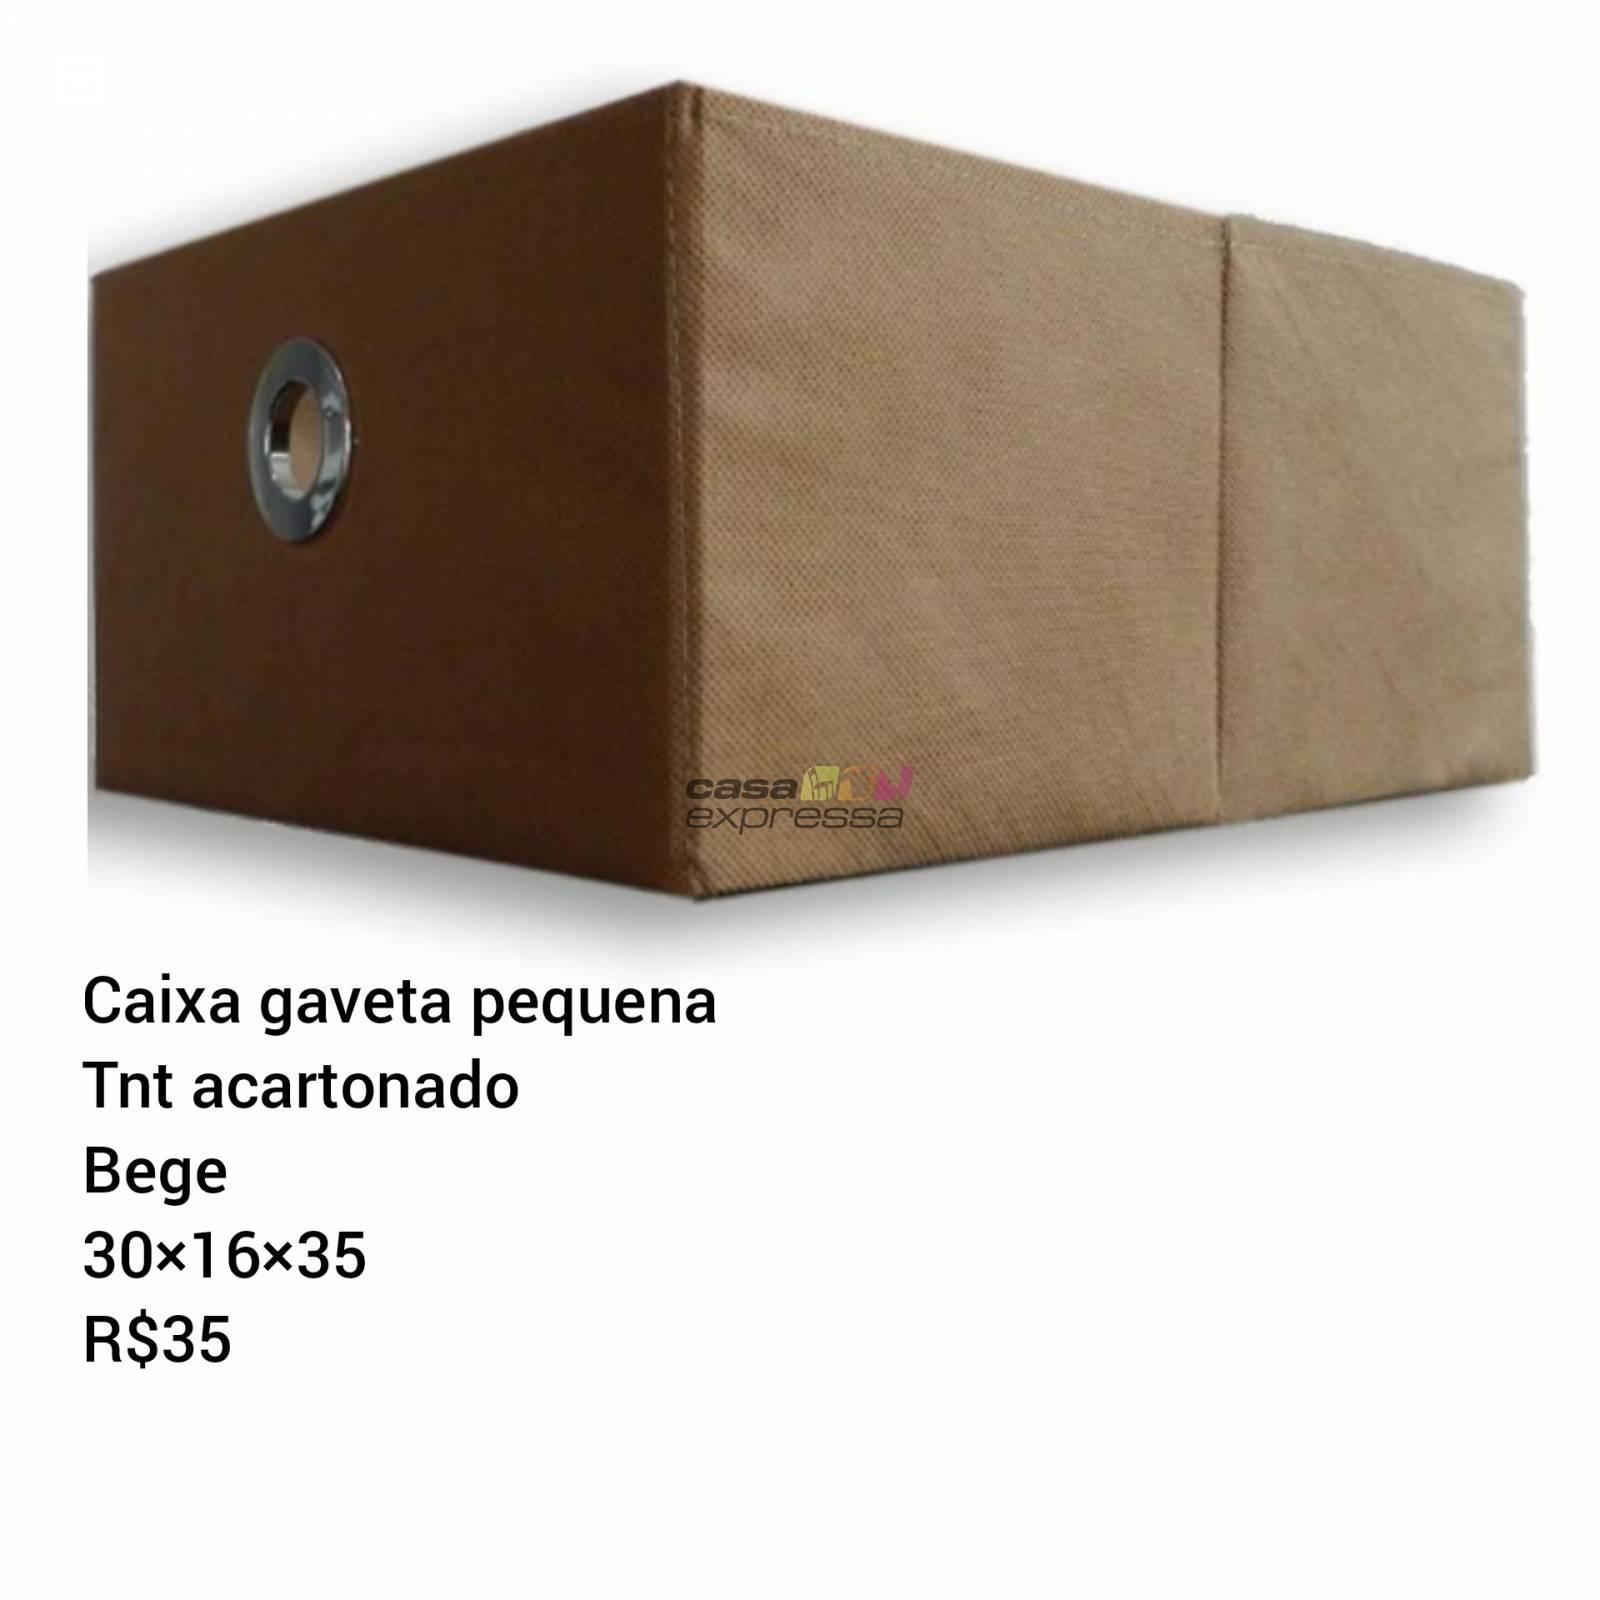 Caixa Gaveta Pequena - CASA EXPRESSA